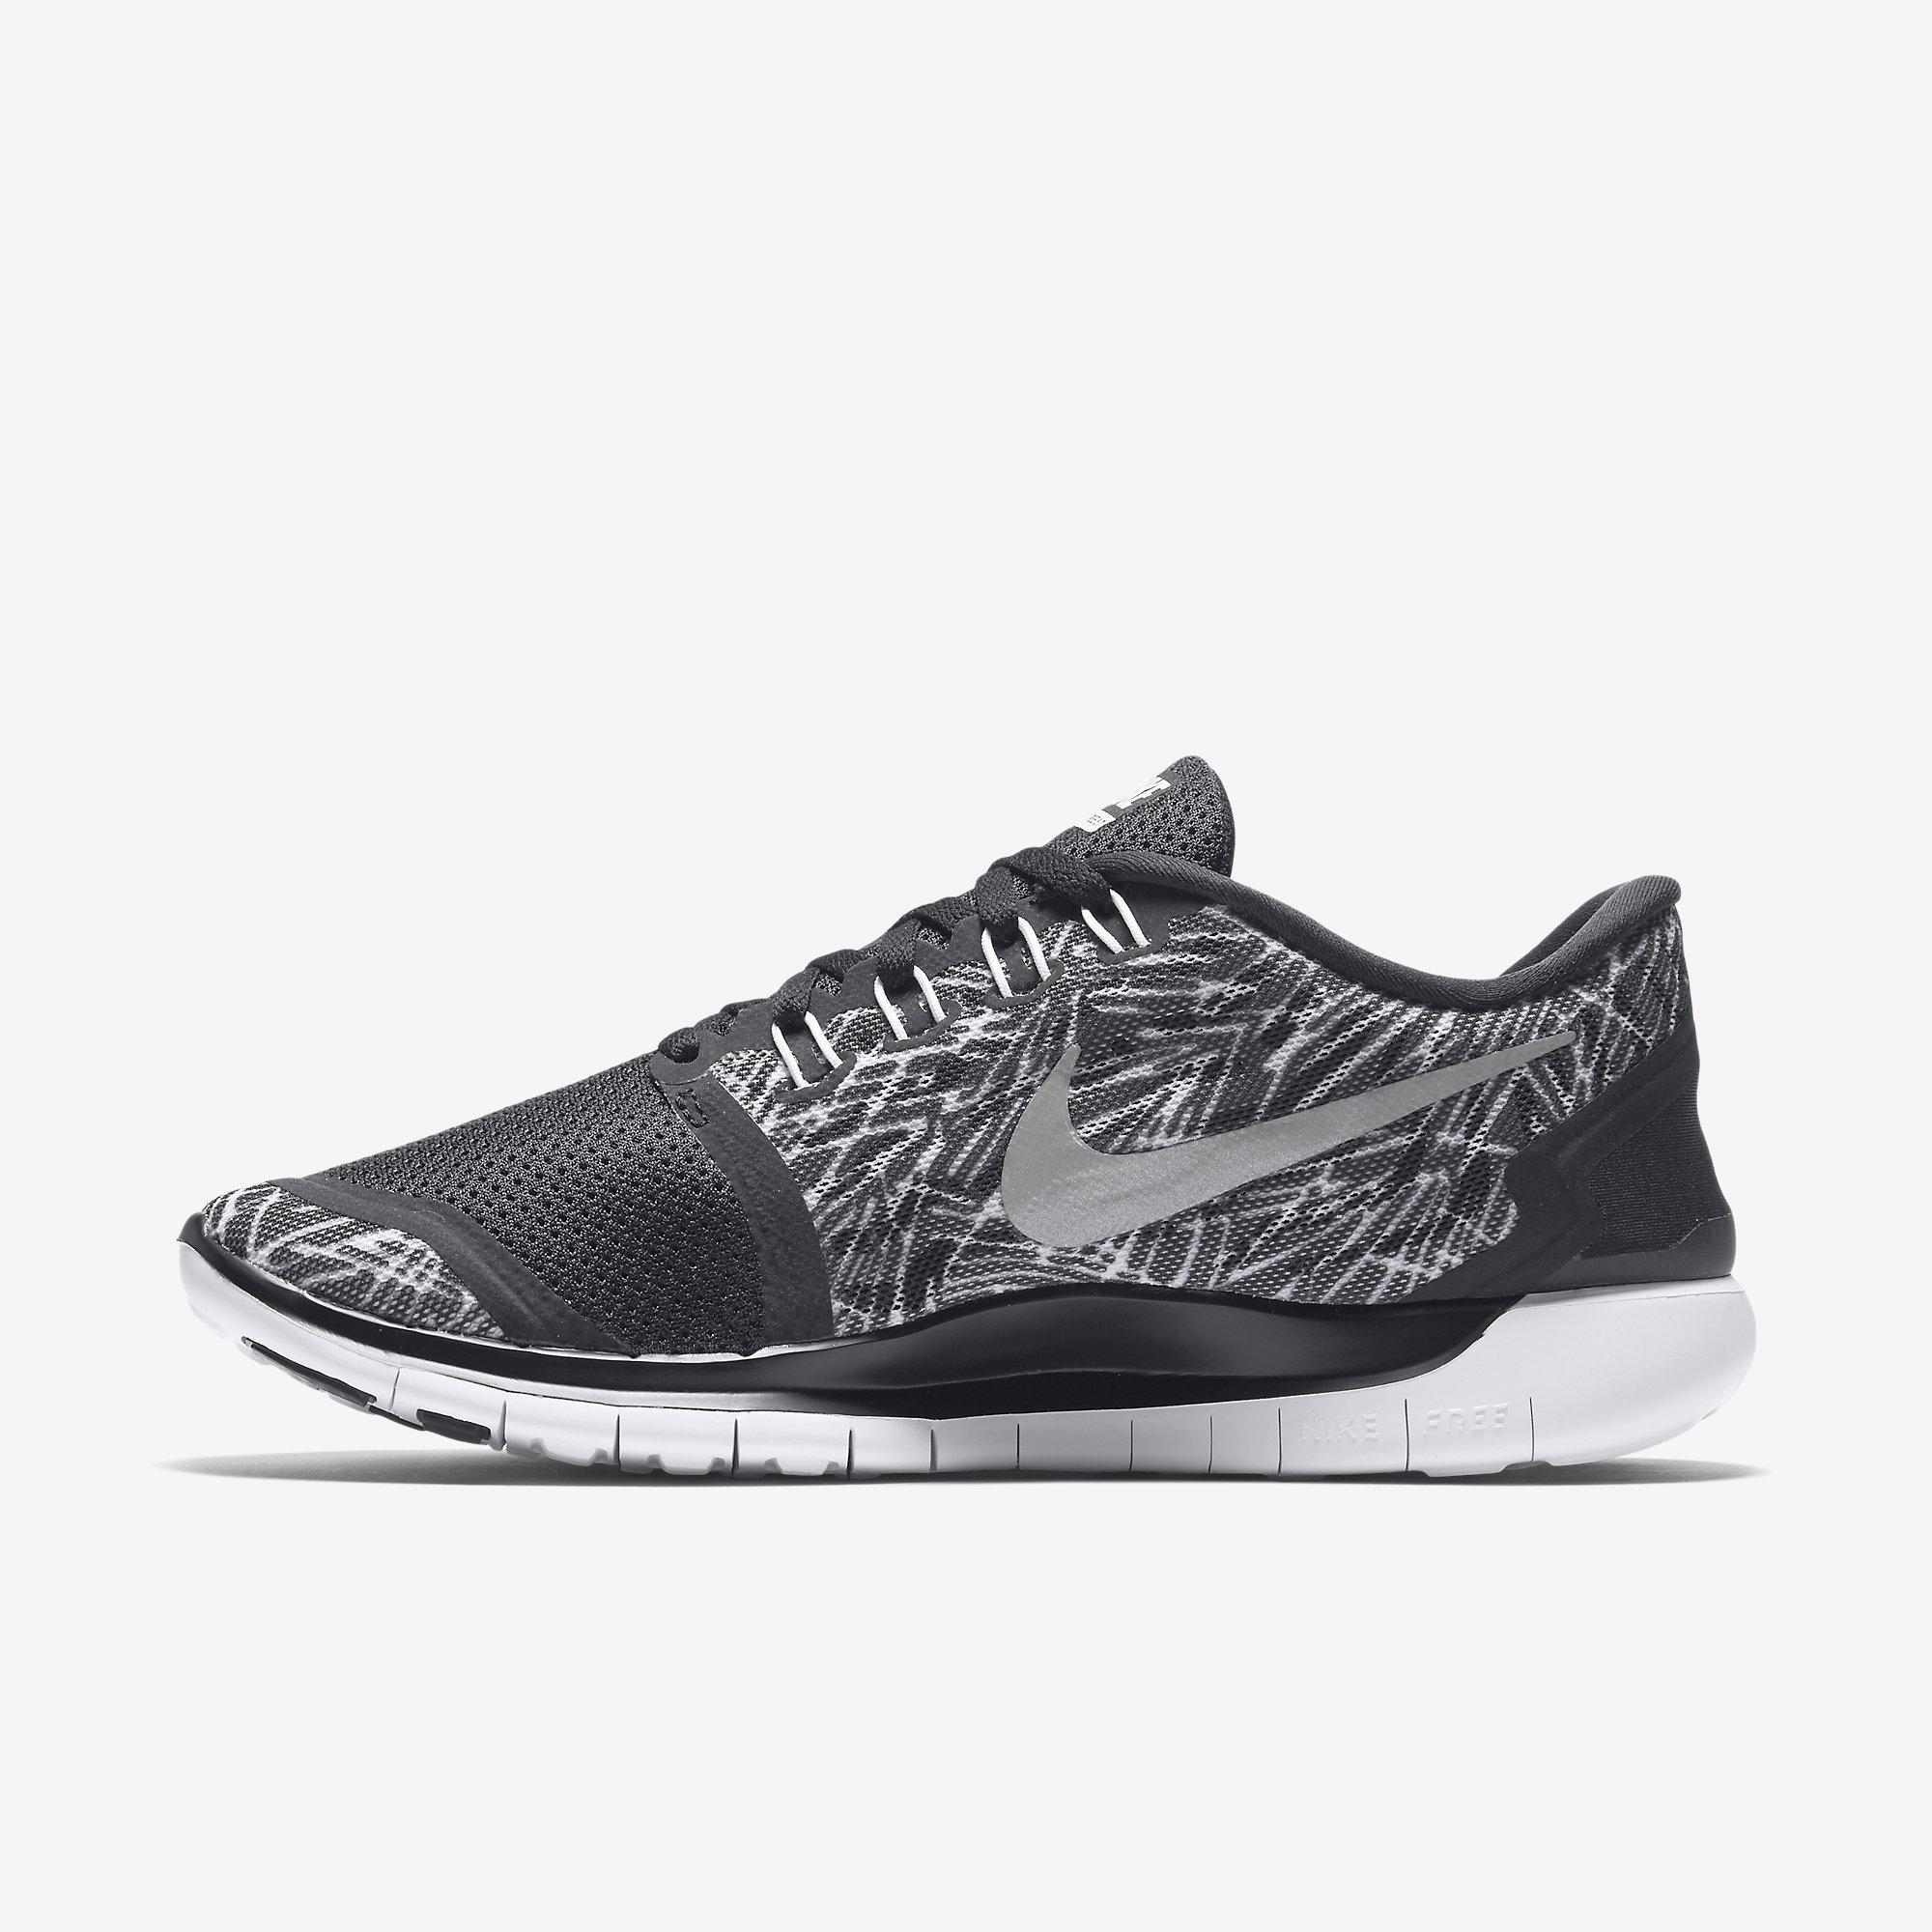 843aaf3abd2f Nike Womens Free 5.0 Print Running Shoes - Black White - Tennisnuts.com